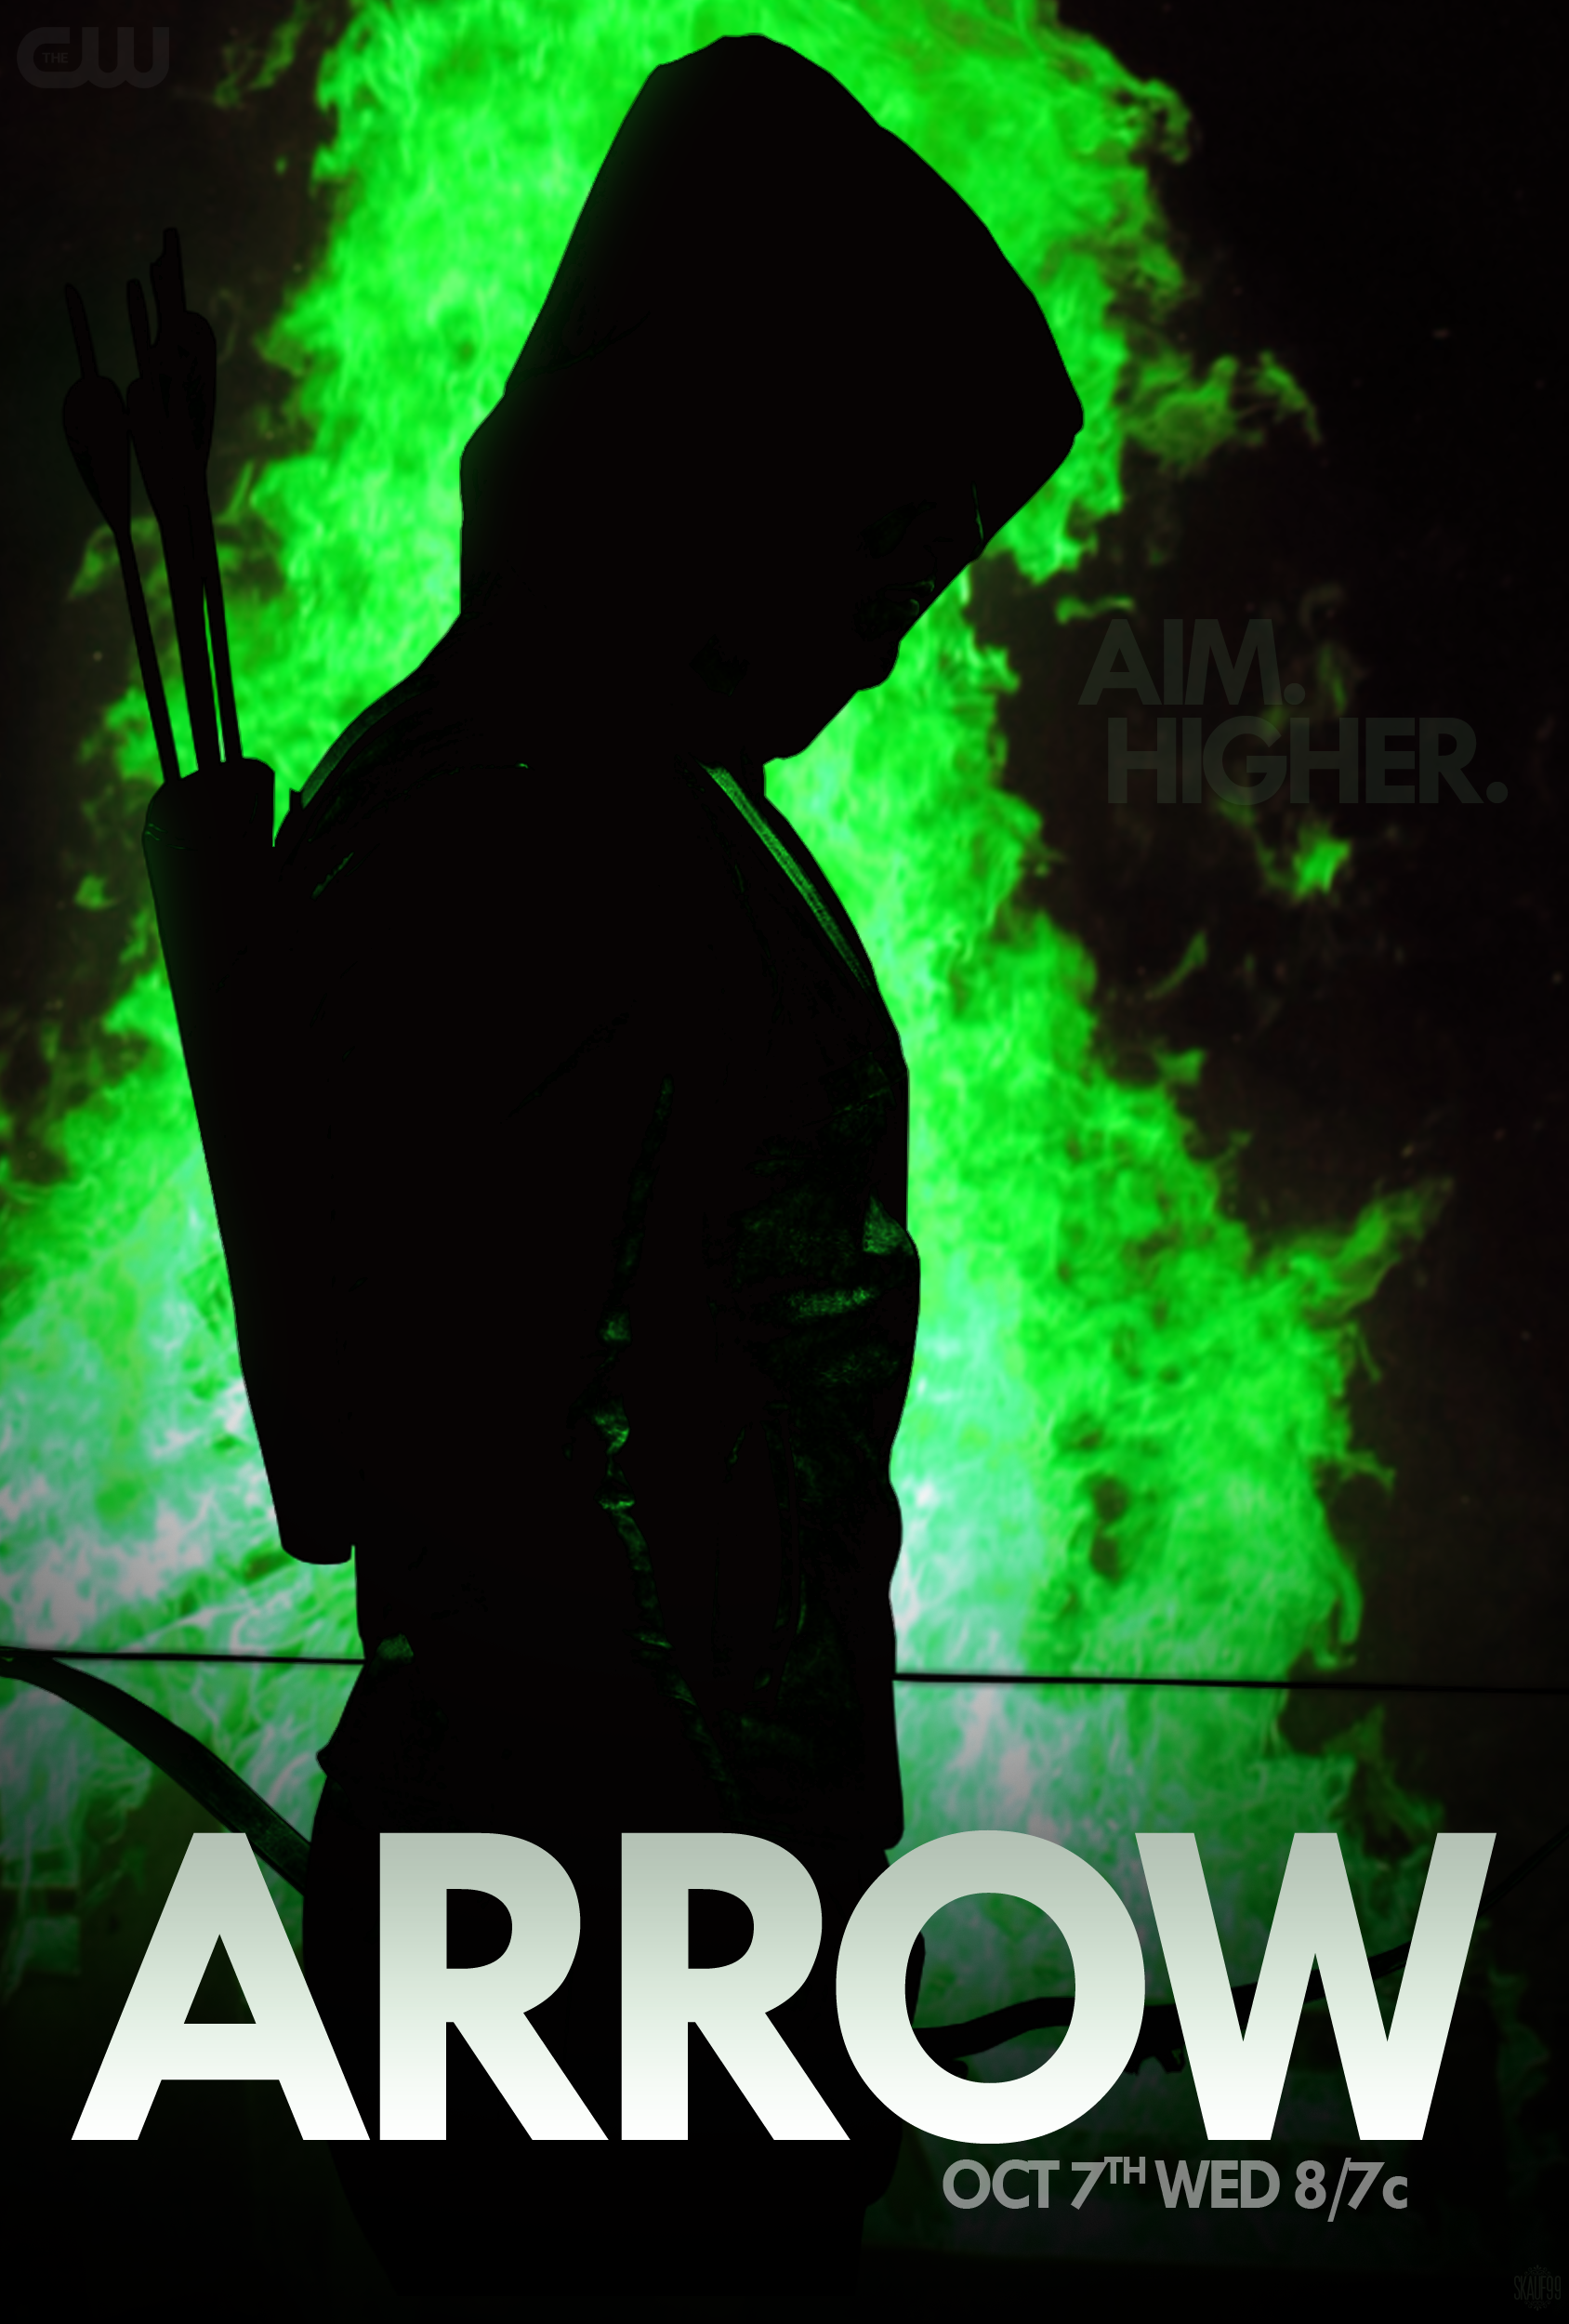 Popular Wallpaper Movie Arrow - cw_arrow_season_4_promo___movie_poster_by_skauf99-d99tj6x  Pic_773425.png